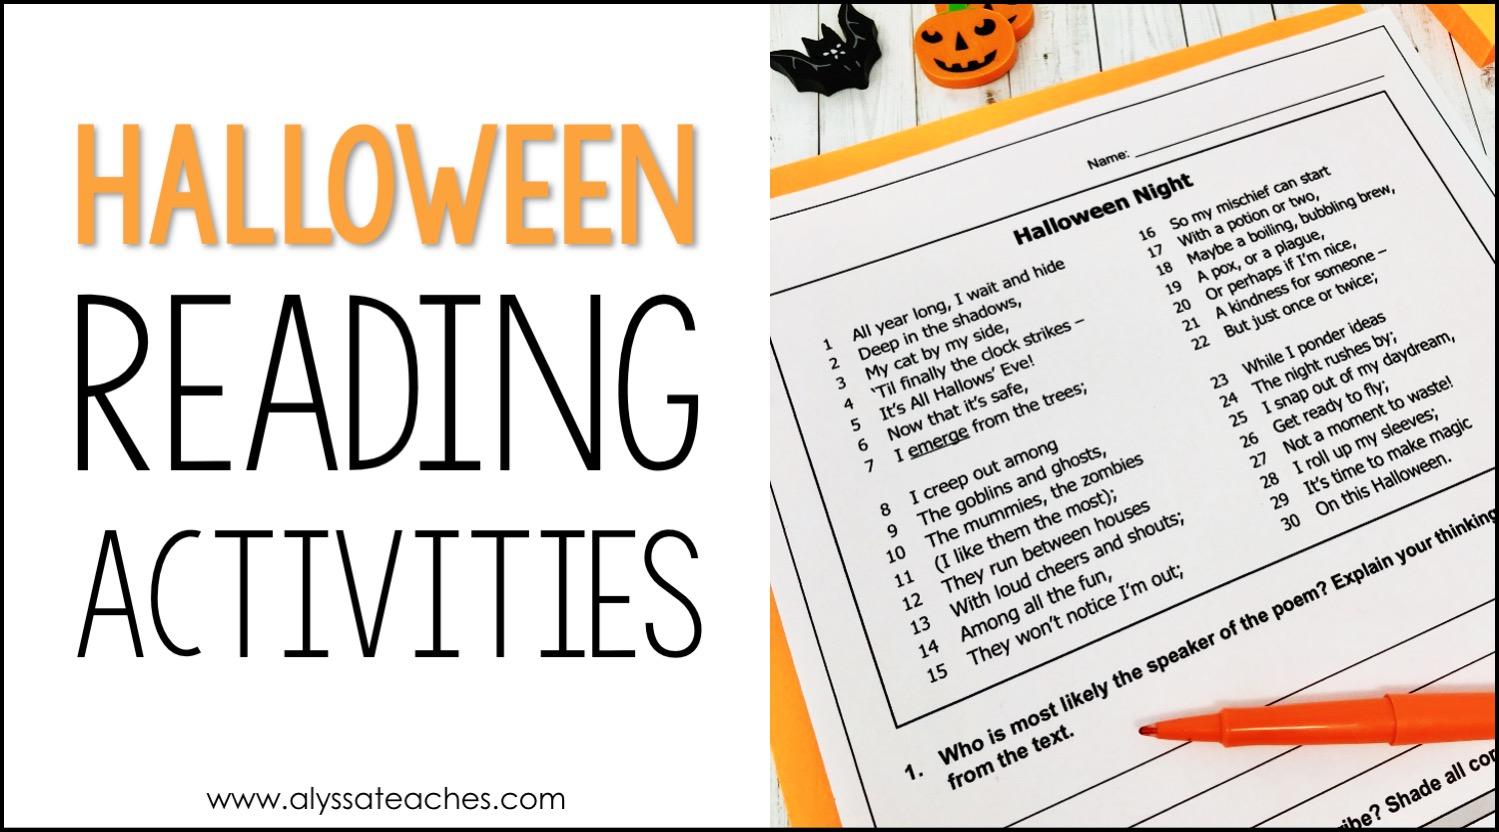 hight resolution of Halloween Reading Activities for 4th Grade - Alyssa Teaches